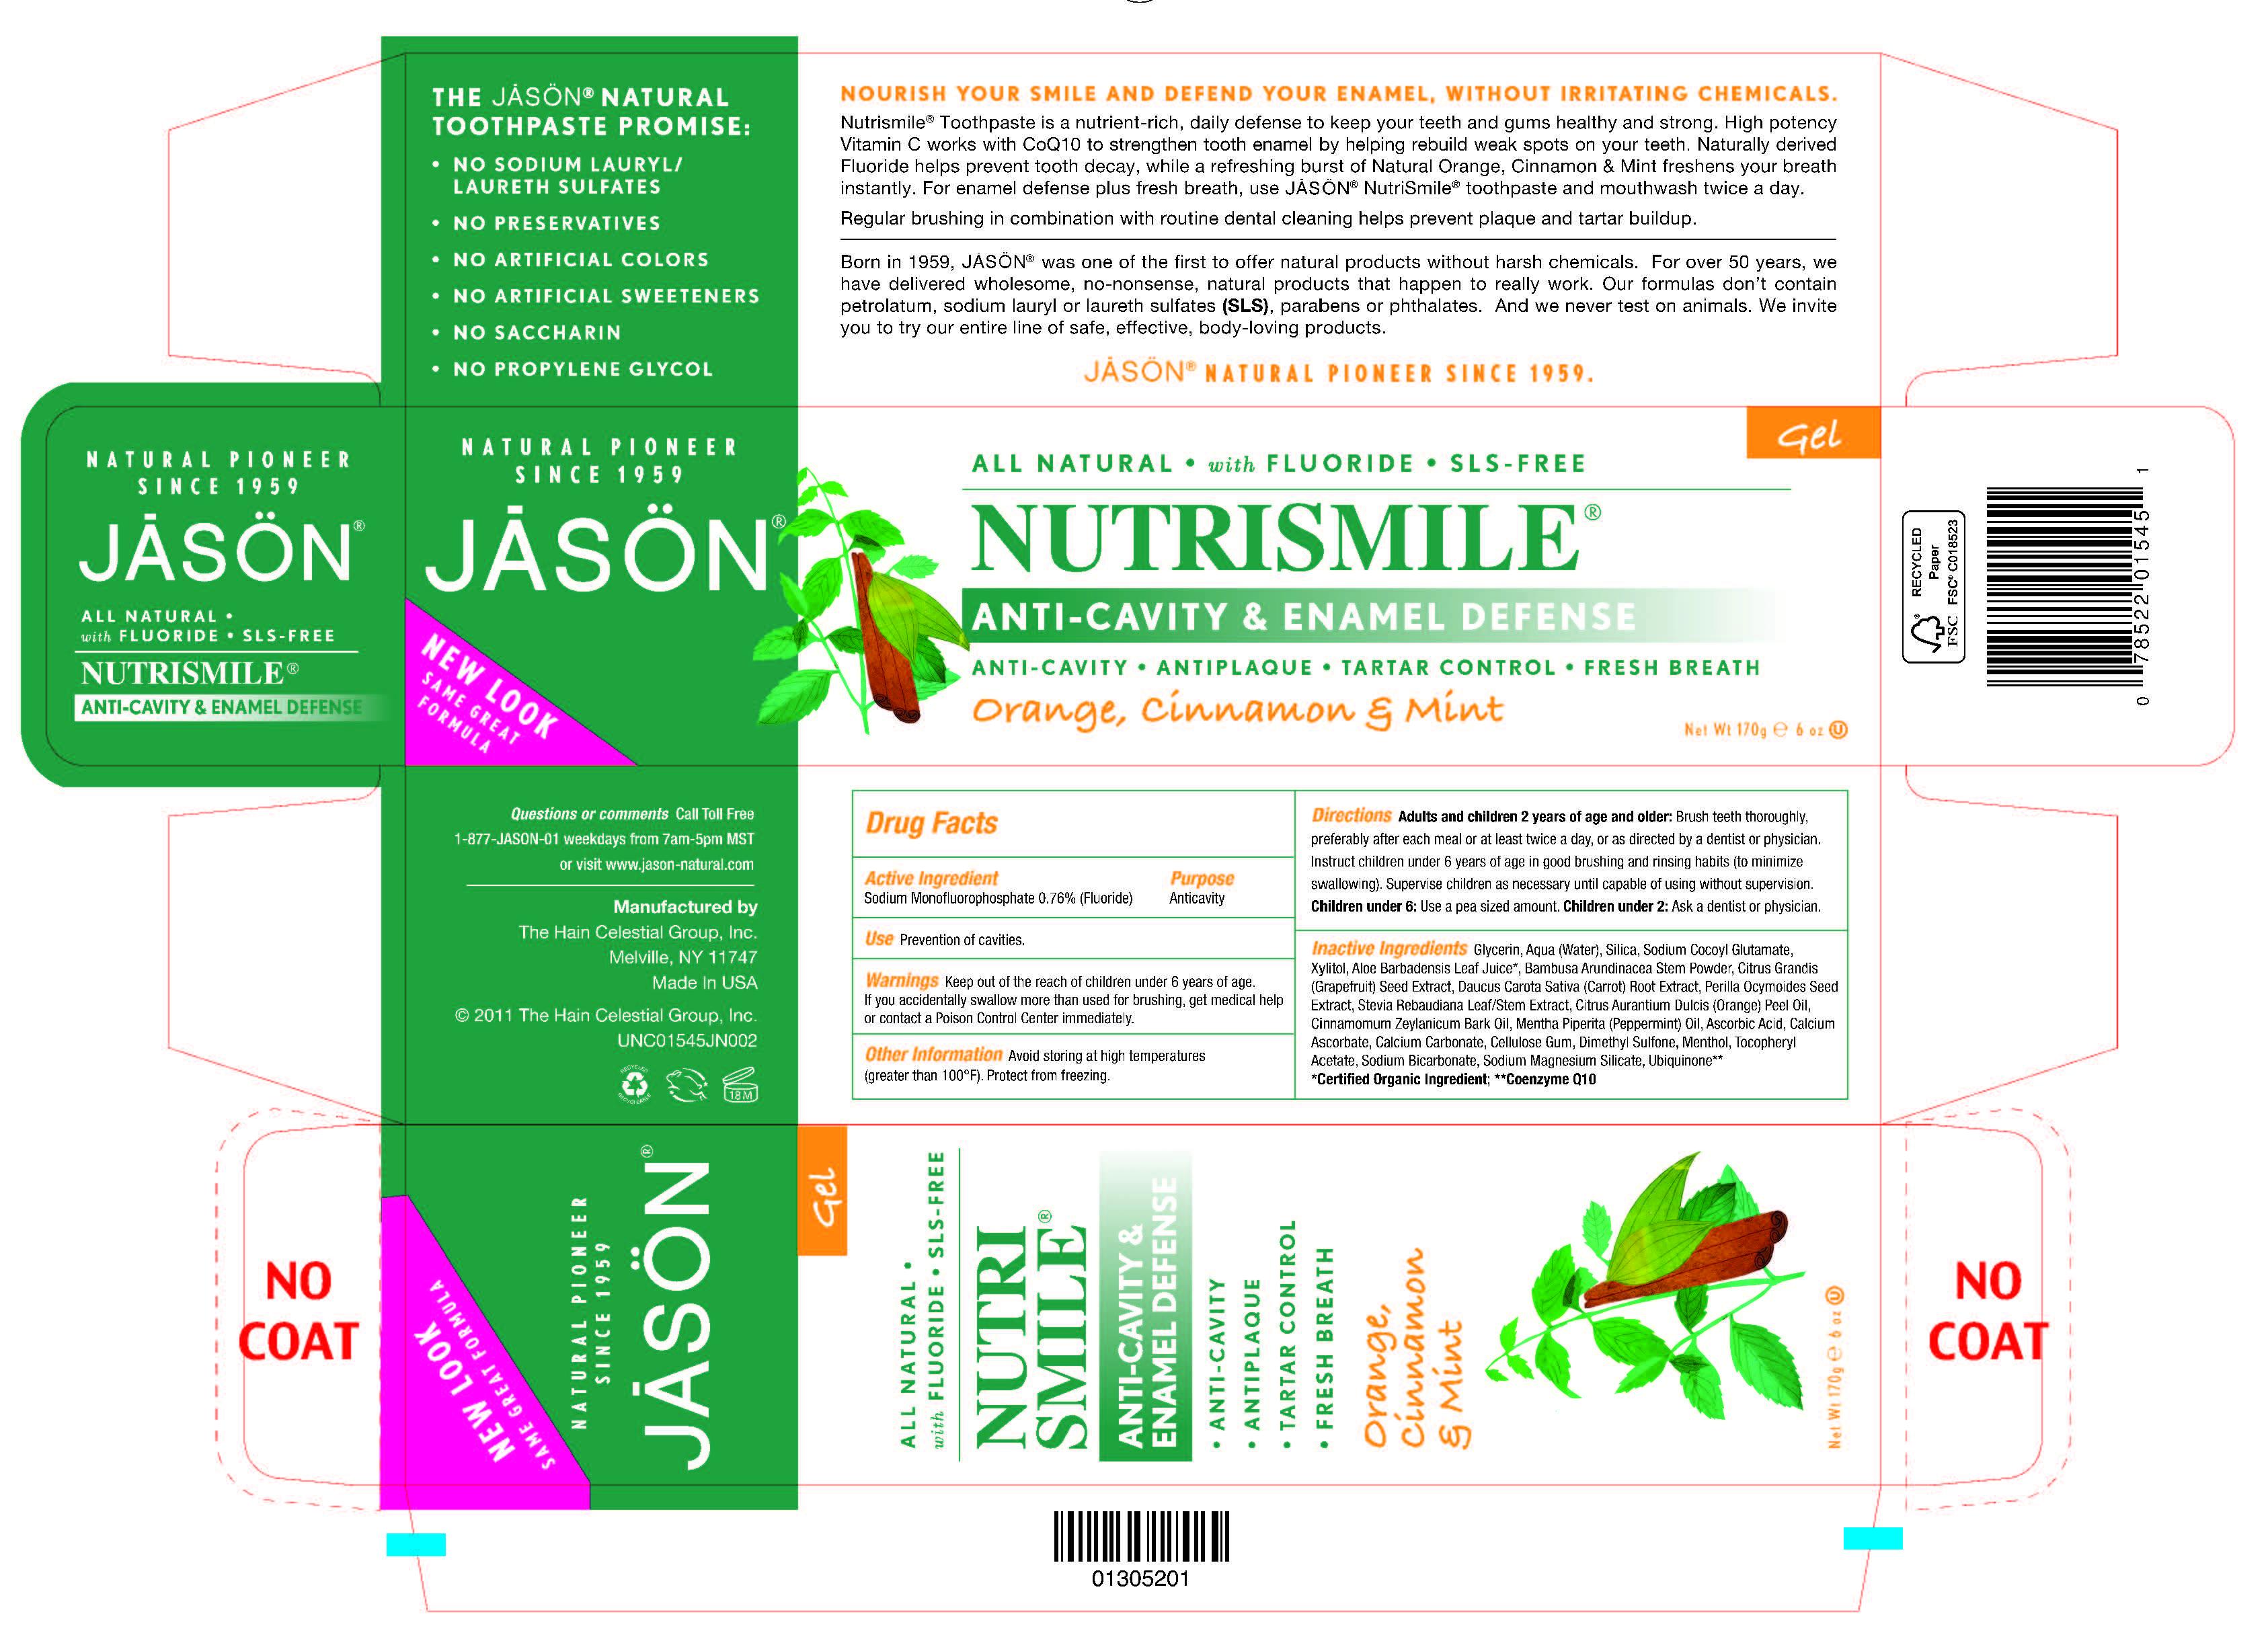 image of carton label